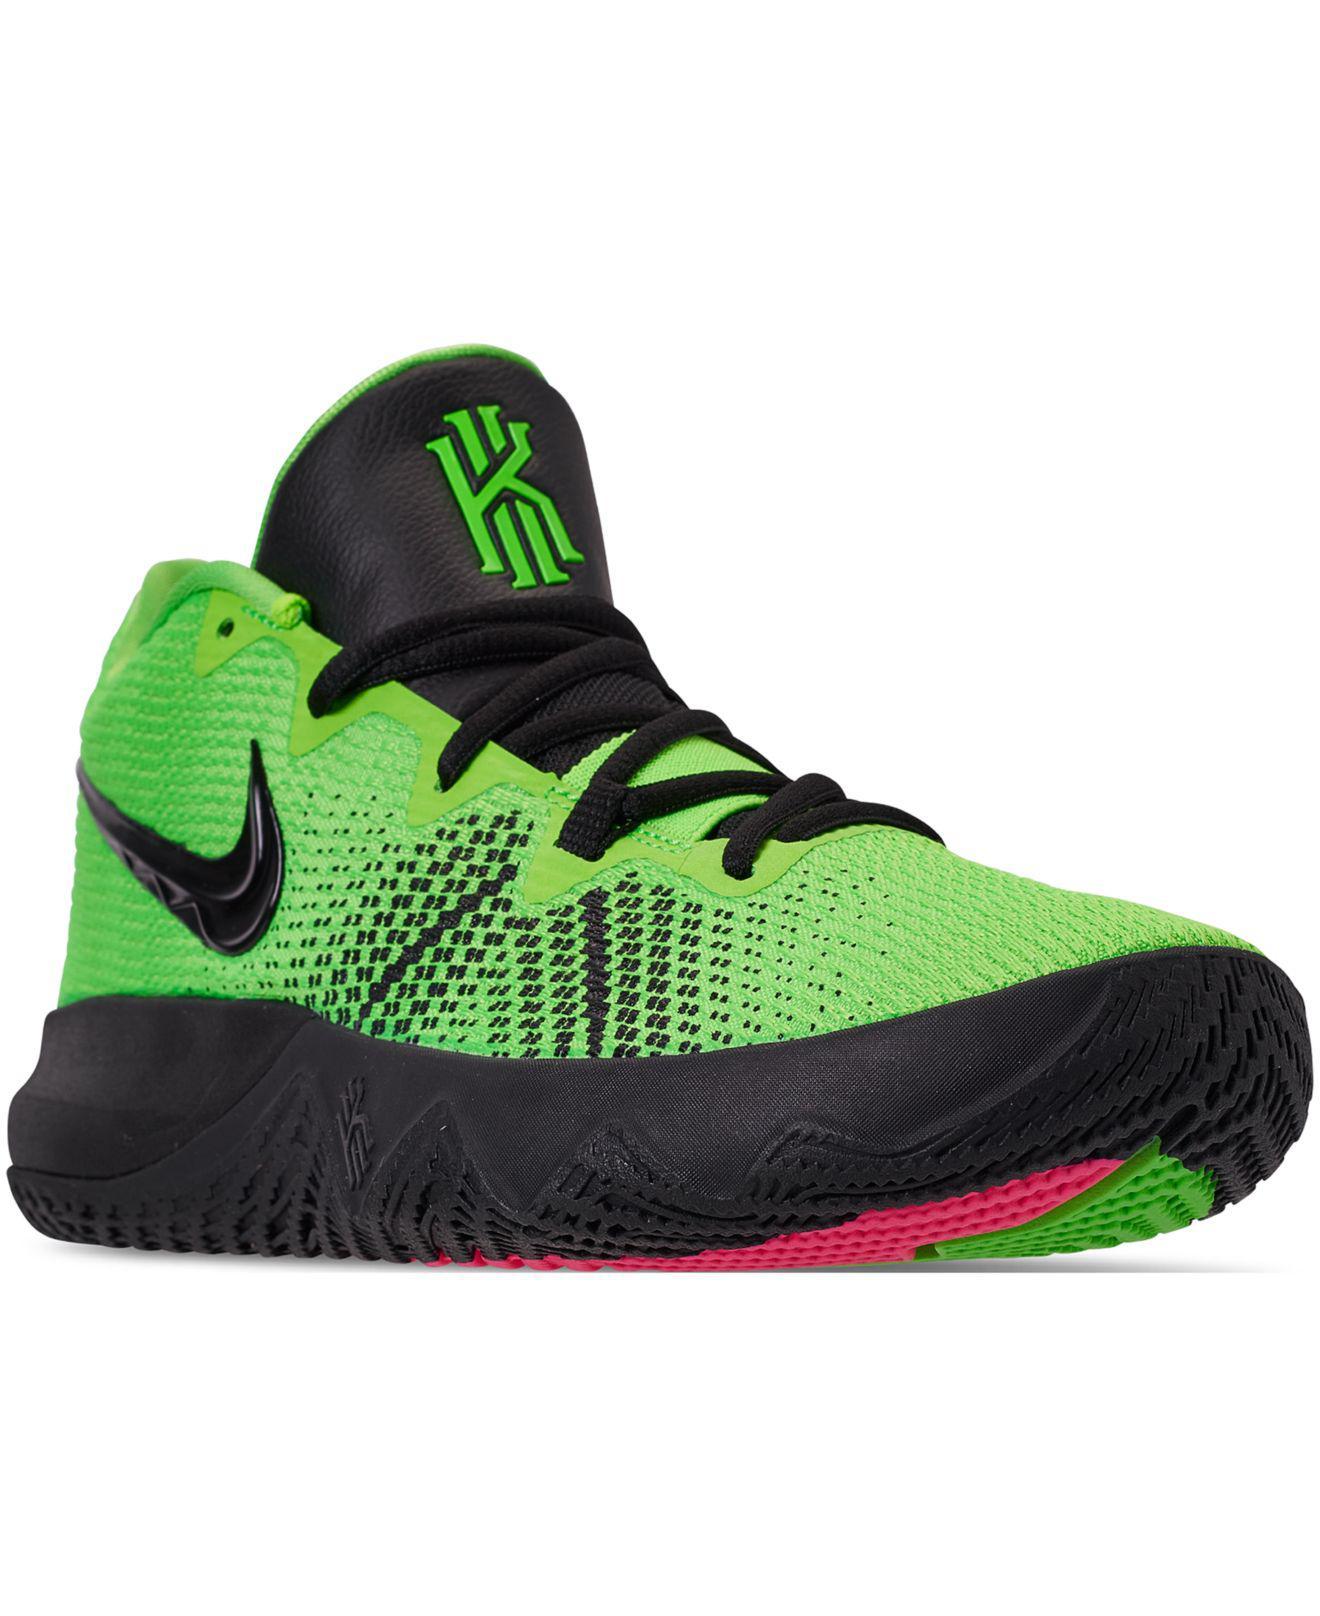 Nike Synthetic Kyrie Flytrap - Size 12